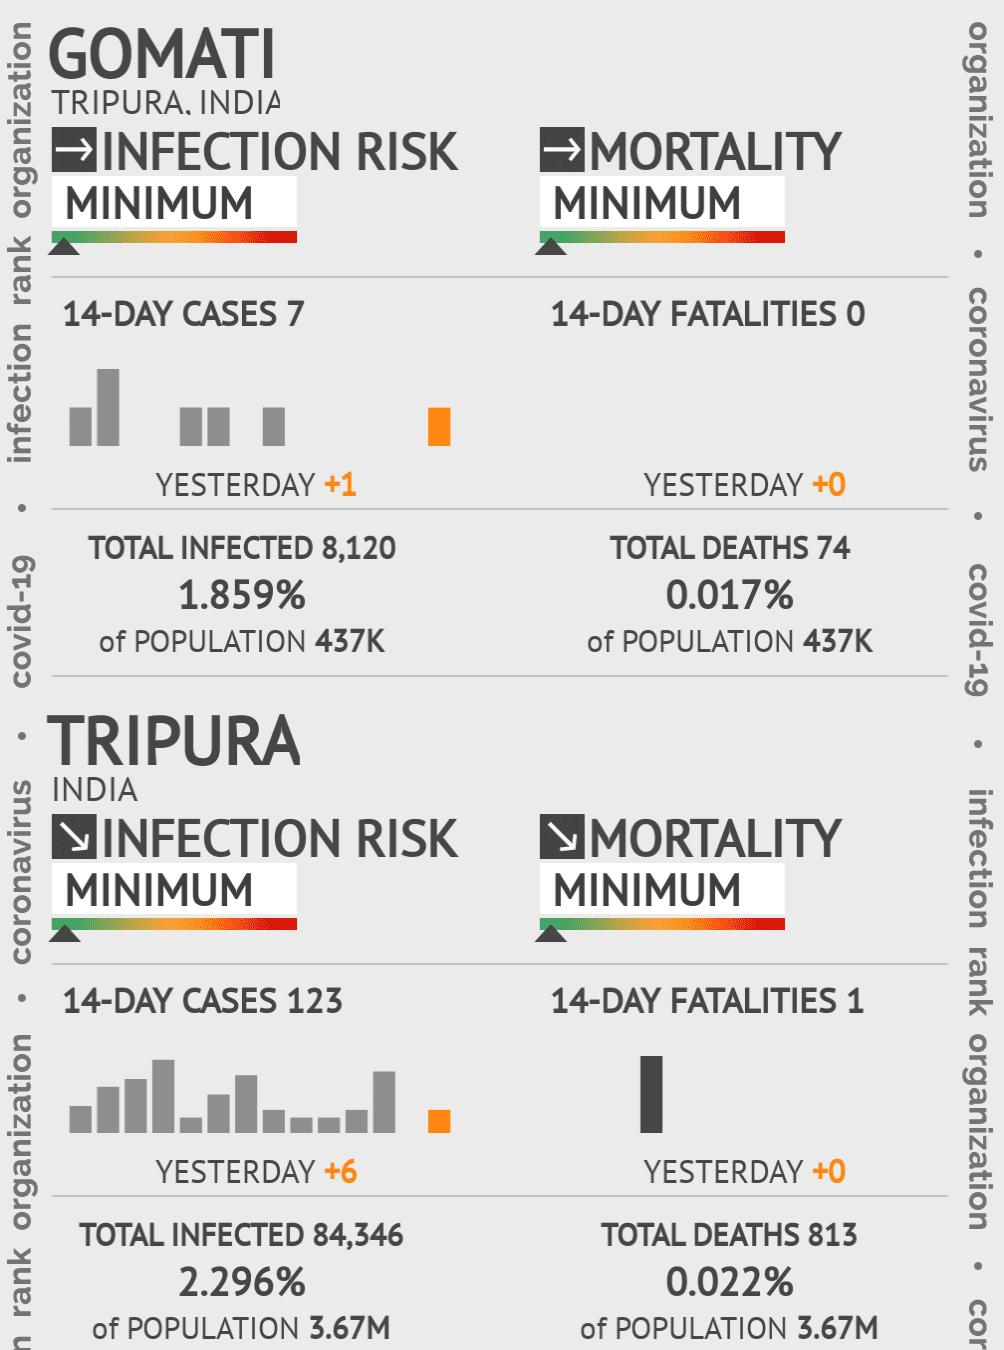 Gomati Coronavirus Covid-19 Risk of Infection on February 28, 2021